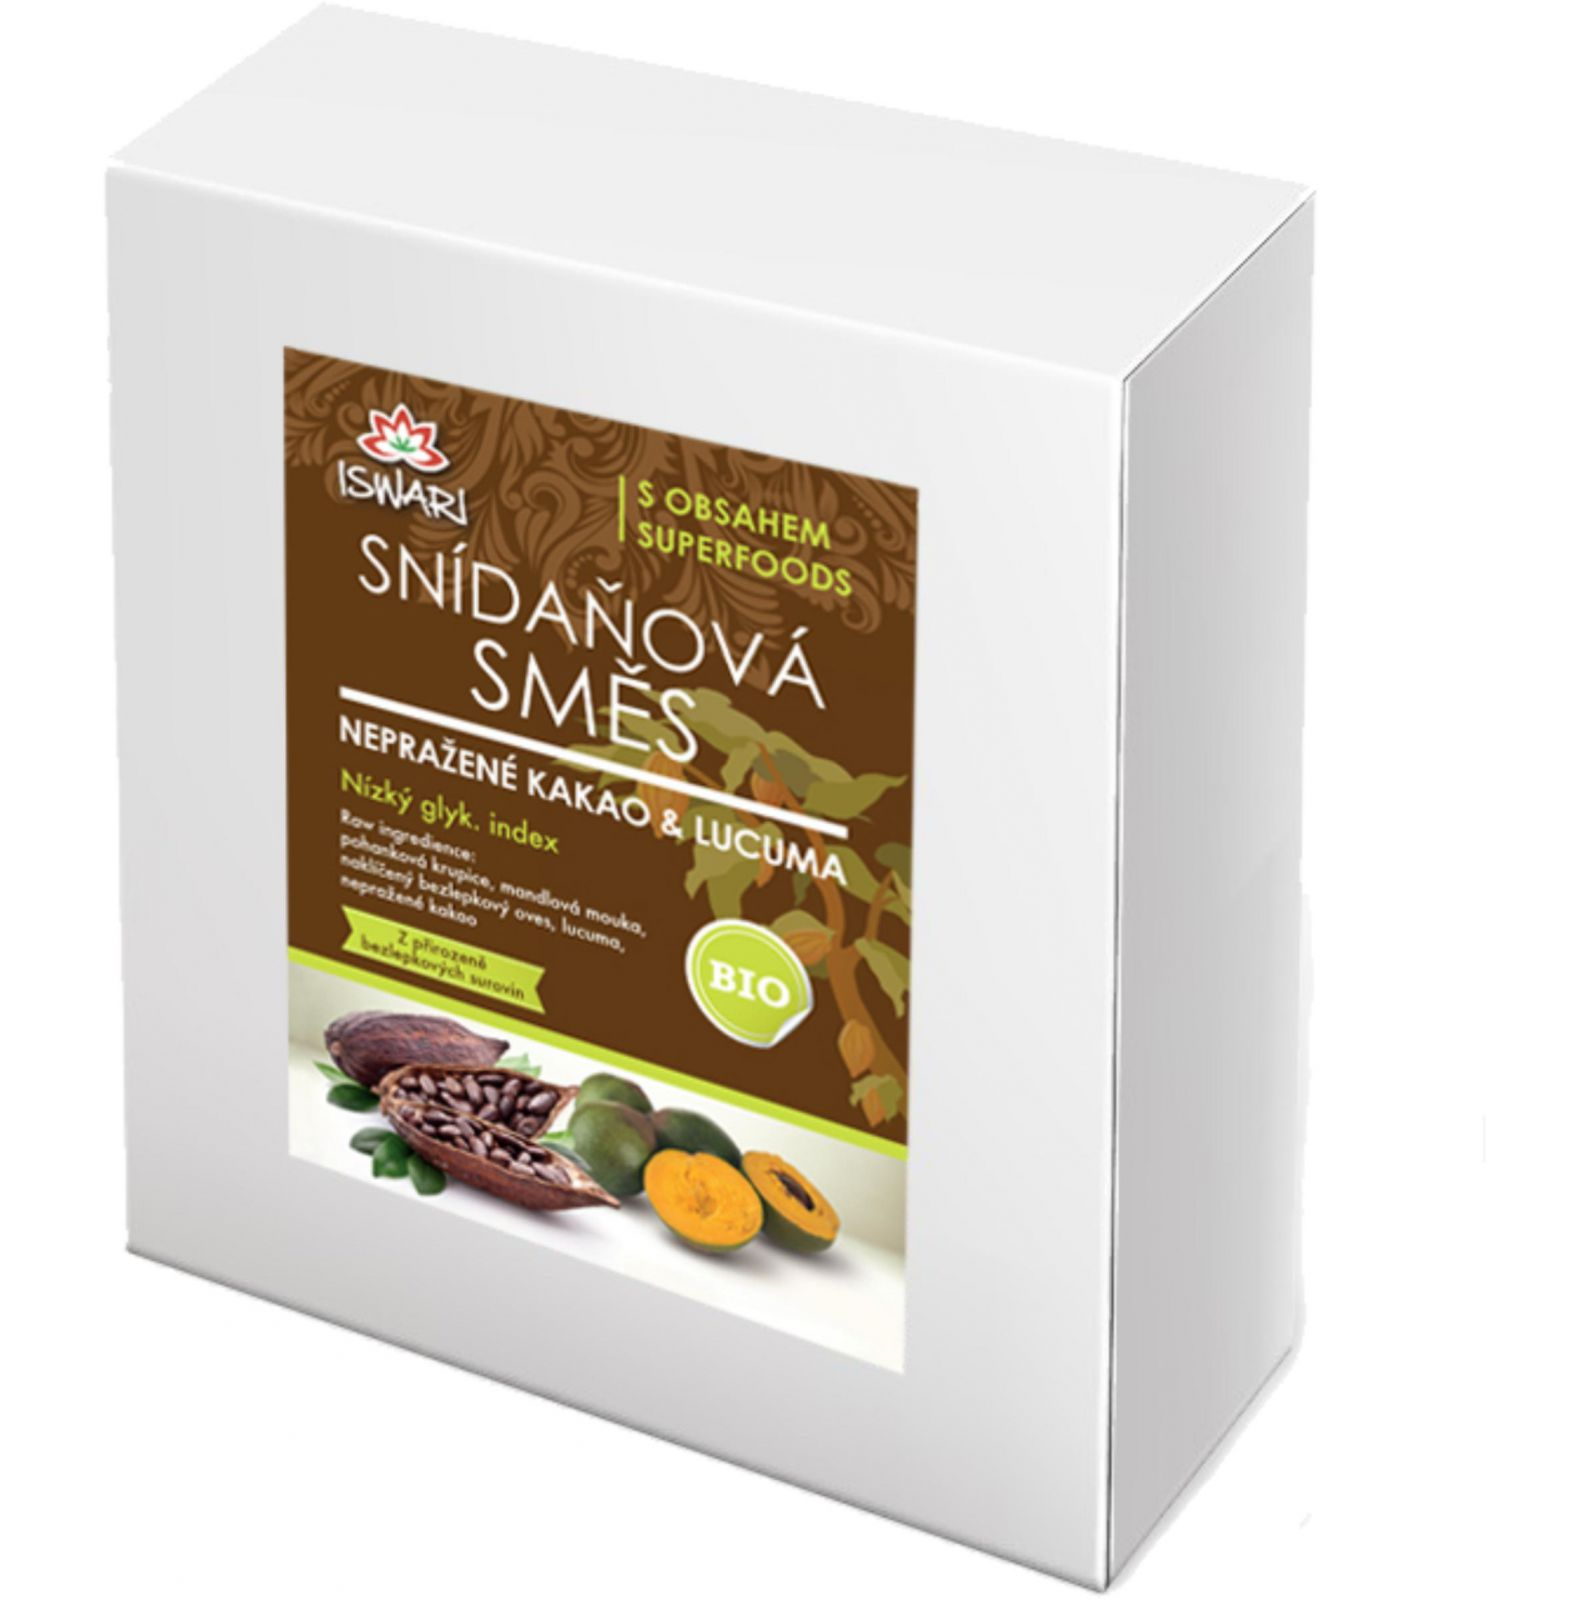 Iswari BIO Snídaňová směs 3200 g - nepražené kakao & lucuma